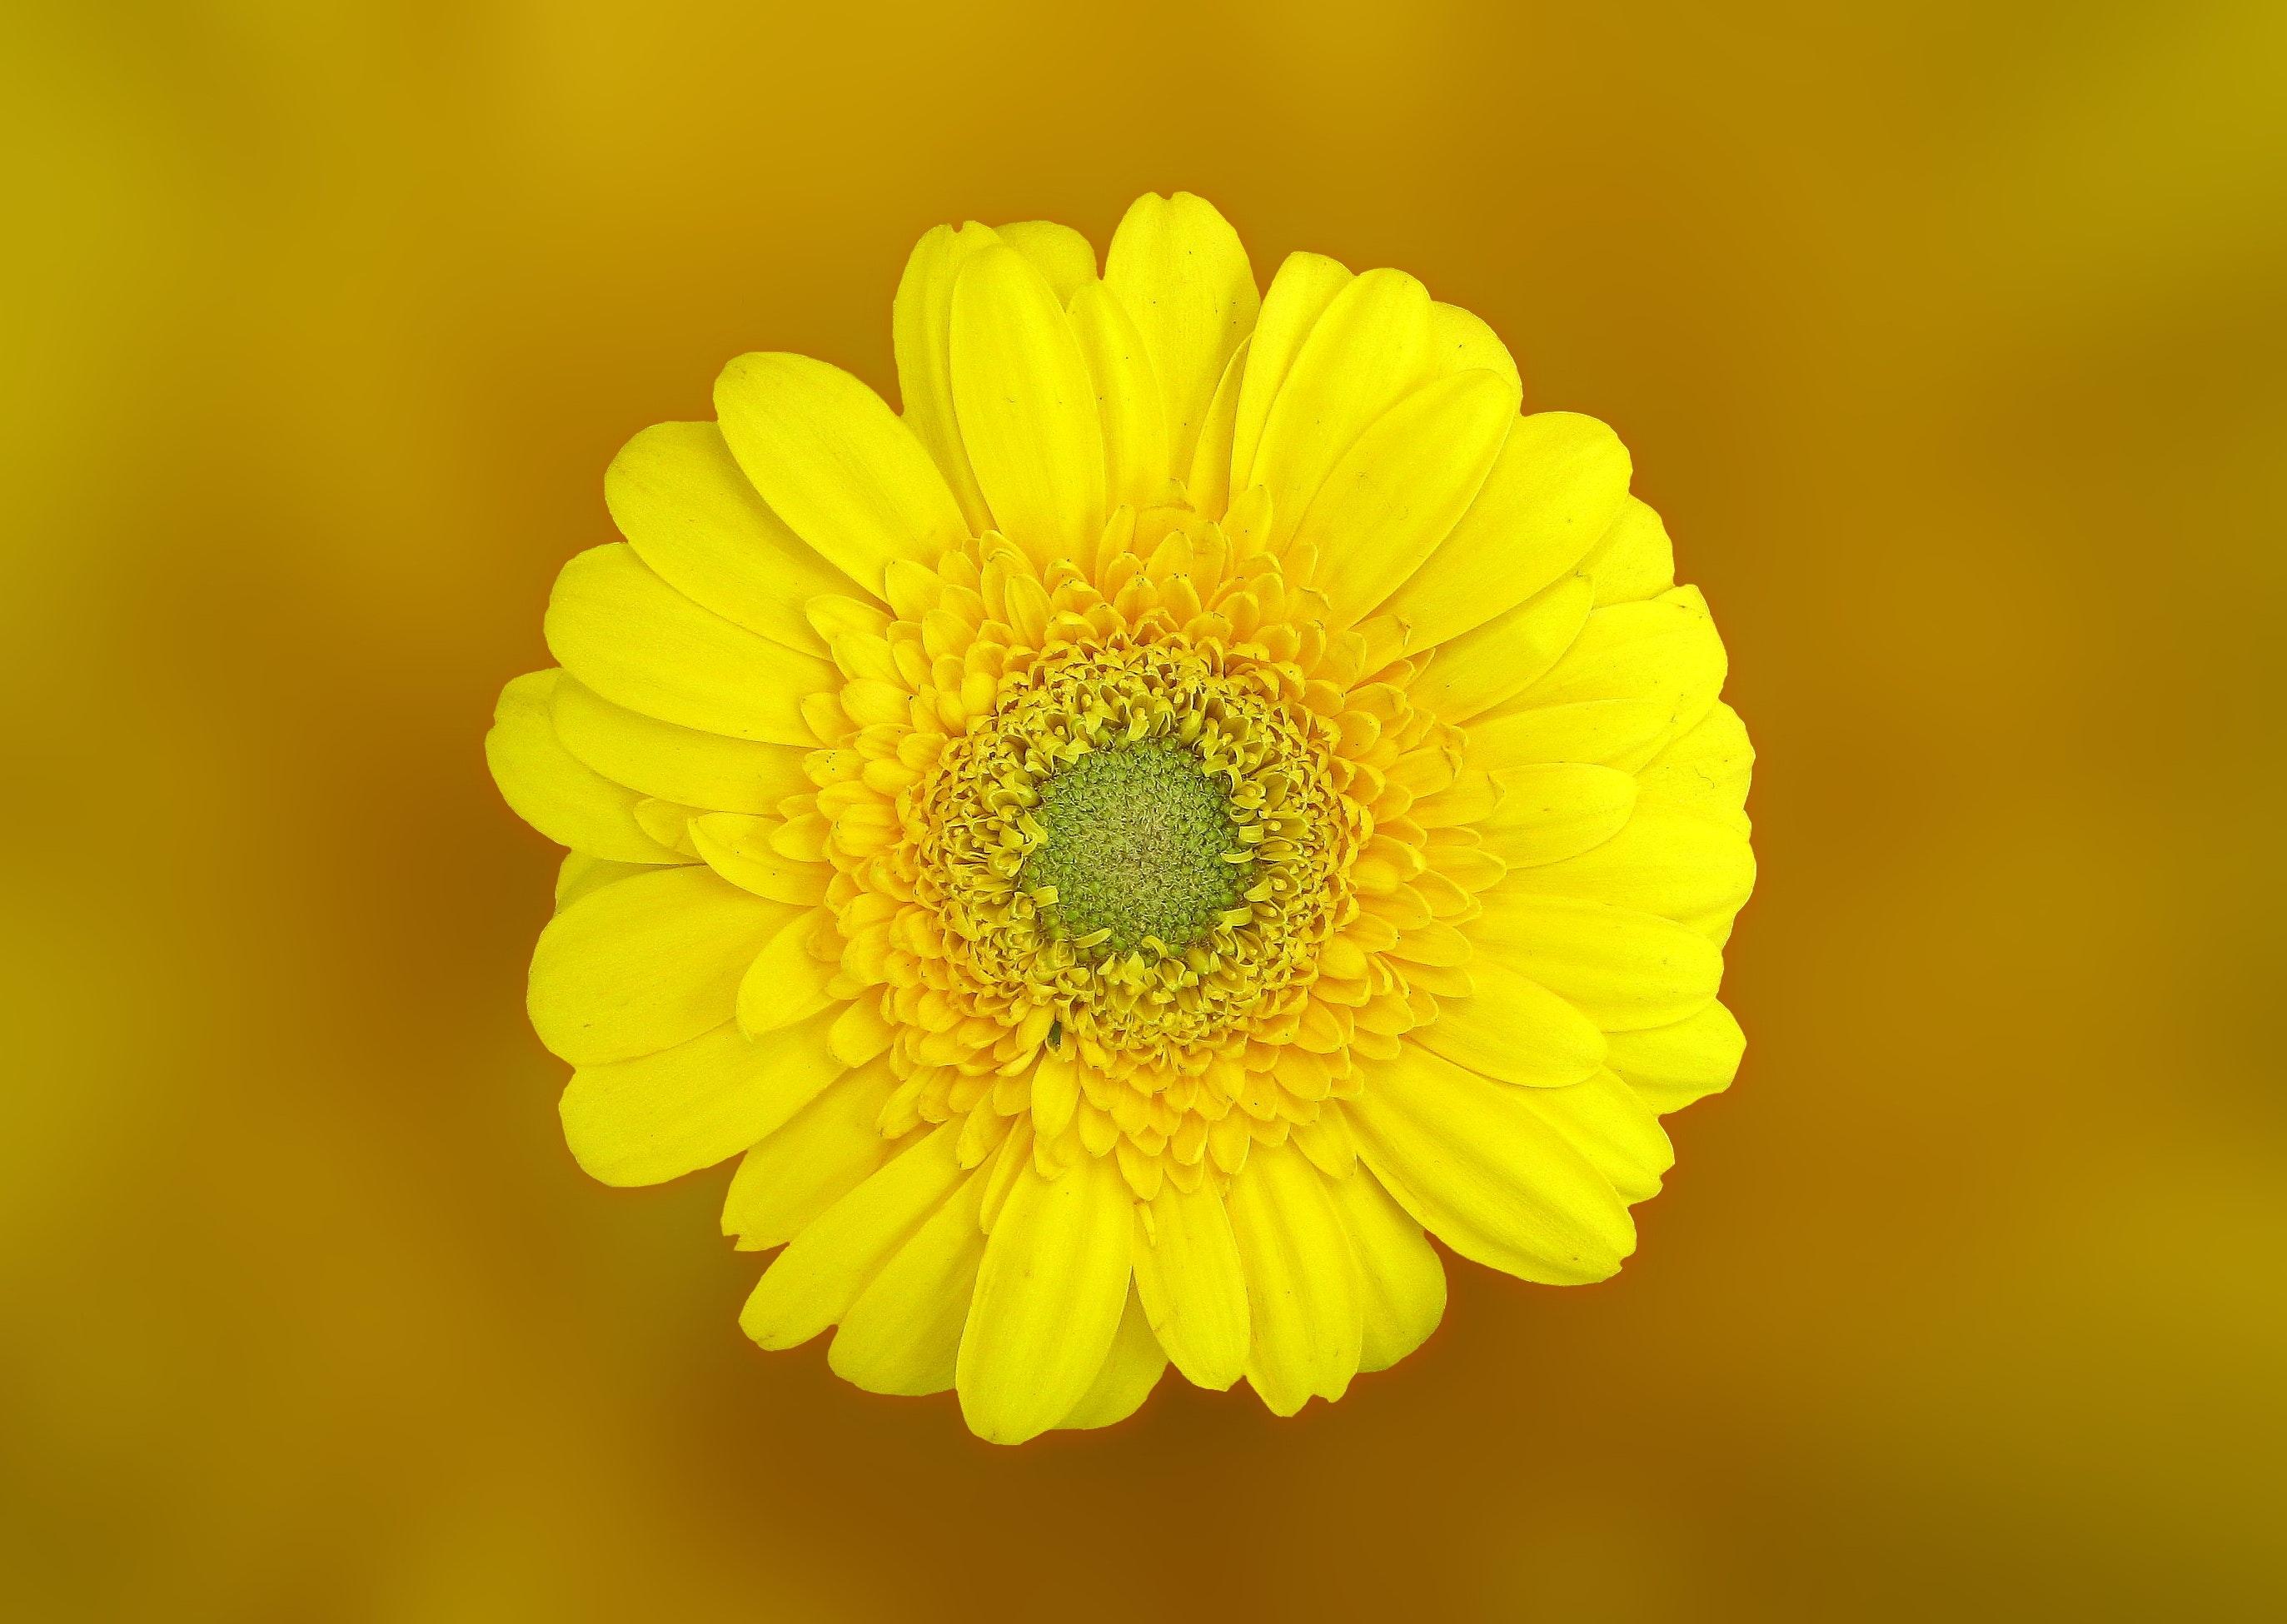 Yellow Daisy In Macro Shot Free Stock Photo